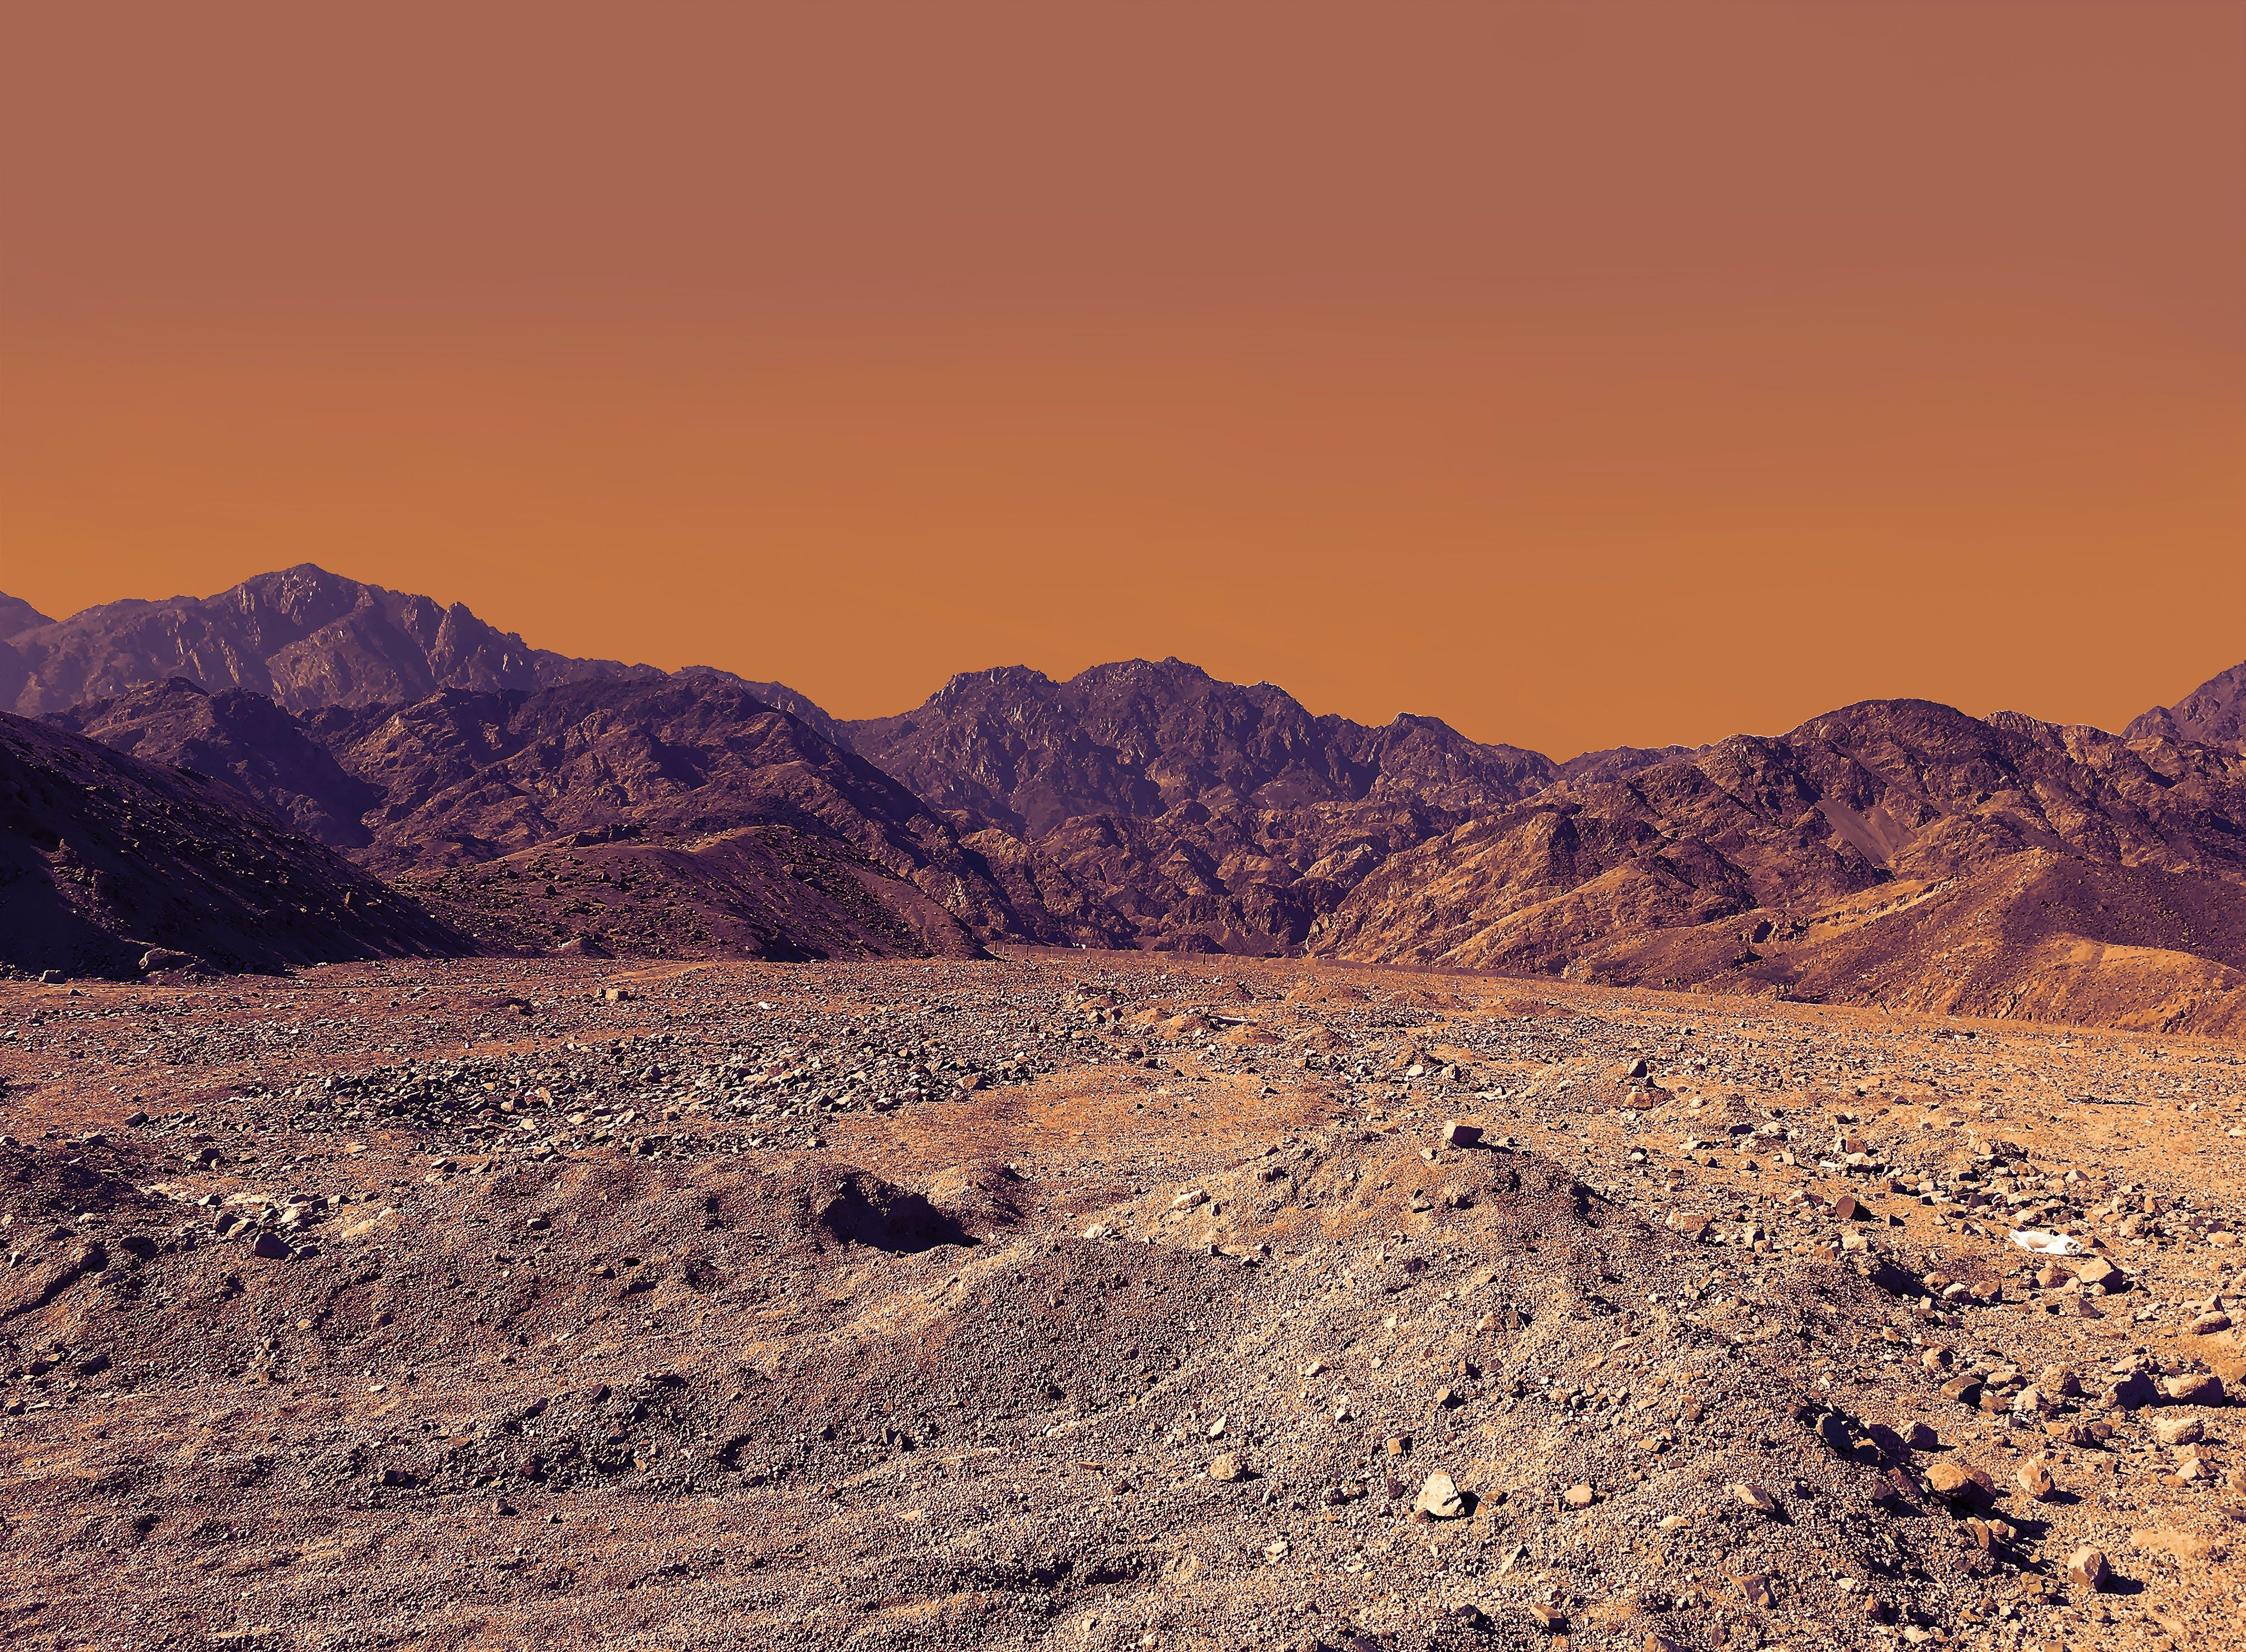 Безкоштовне стокове фото на тему «mobilechallenge, апельсин, Геологія, гори»